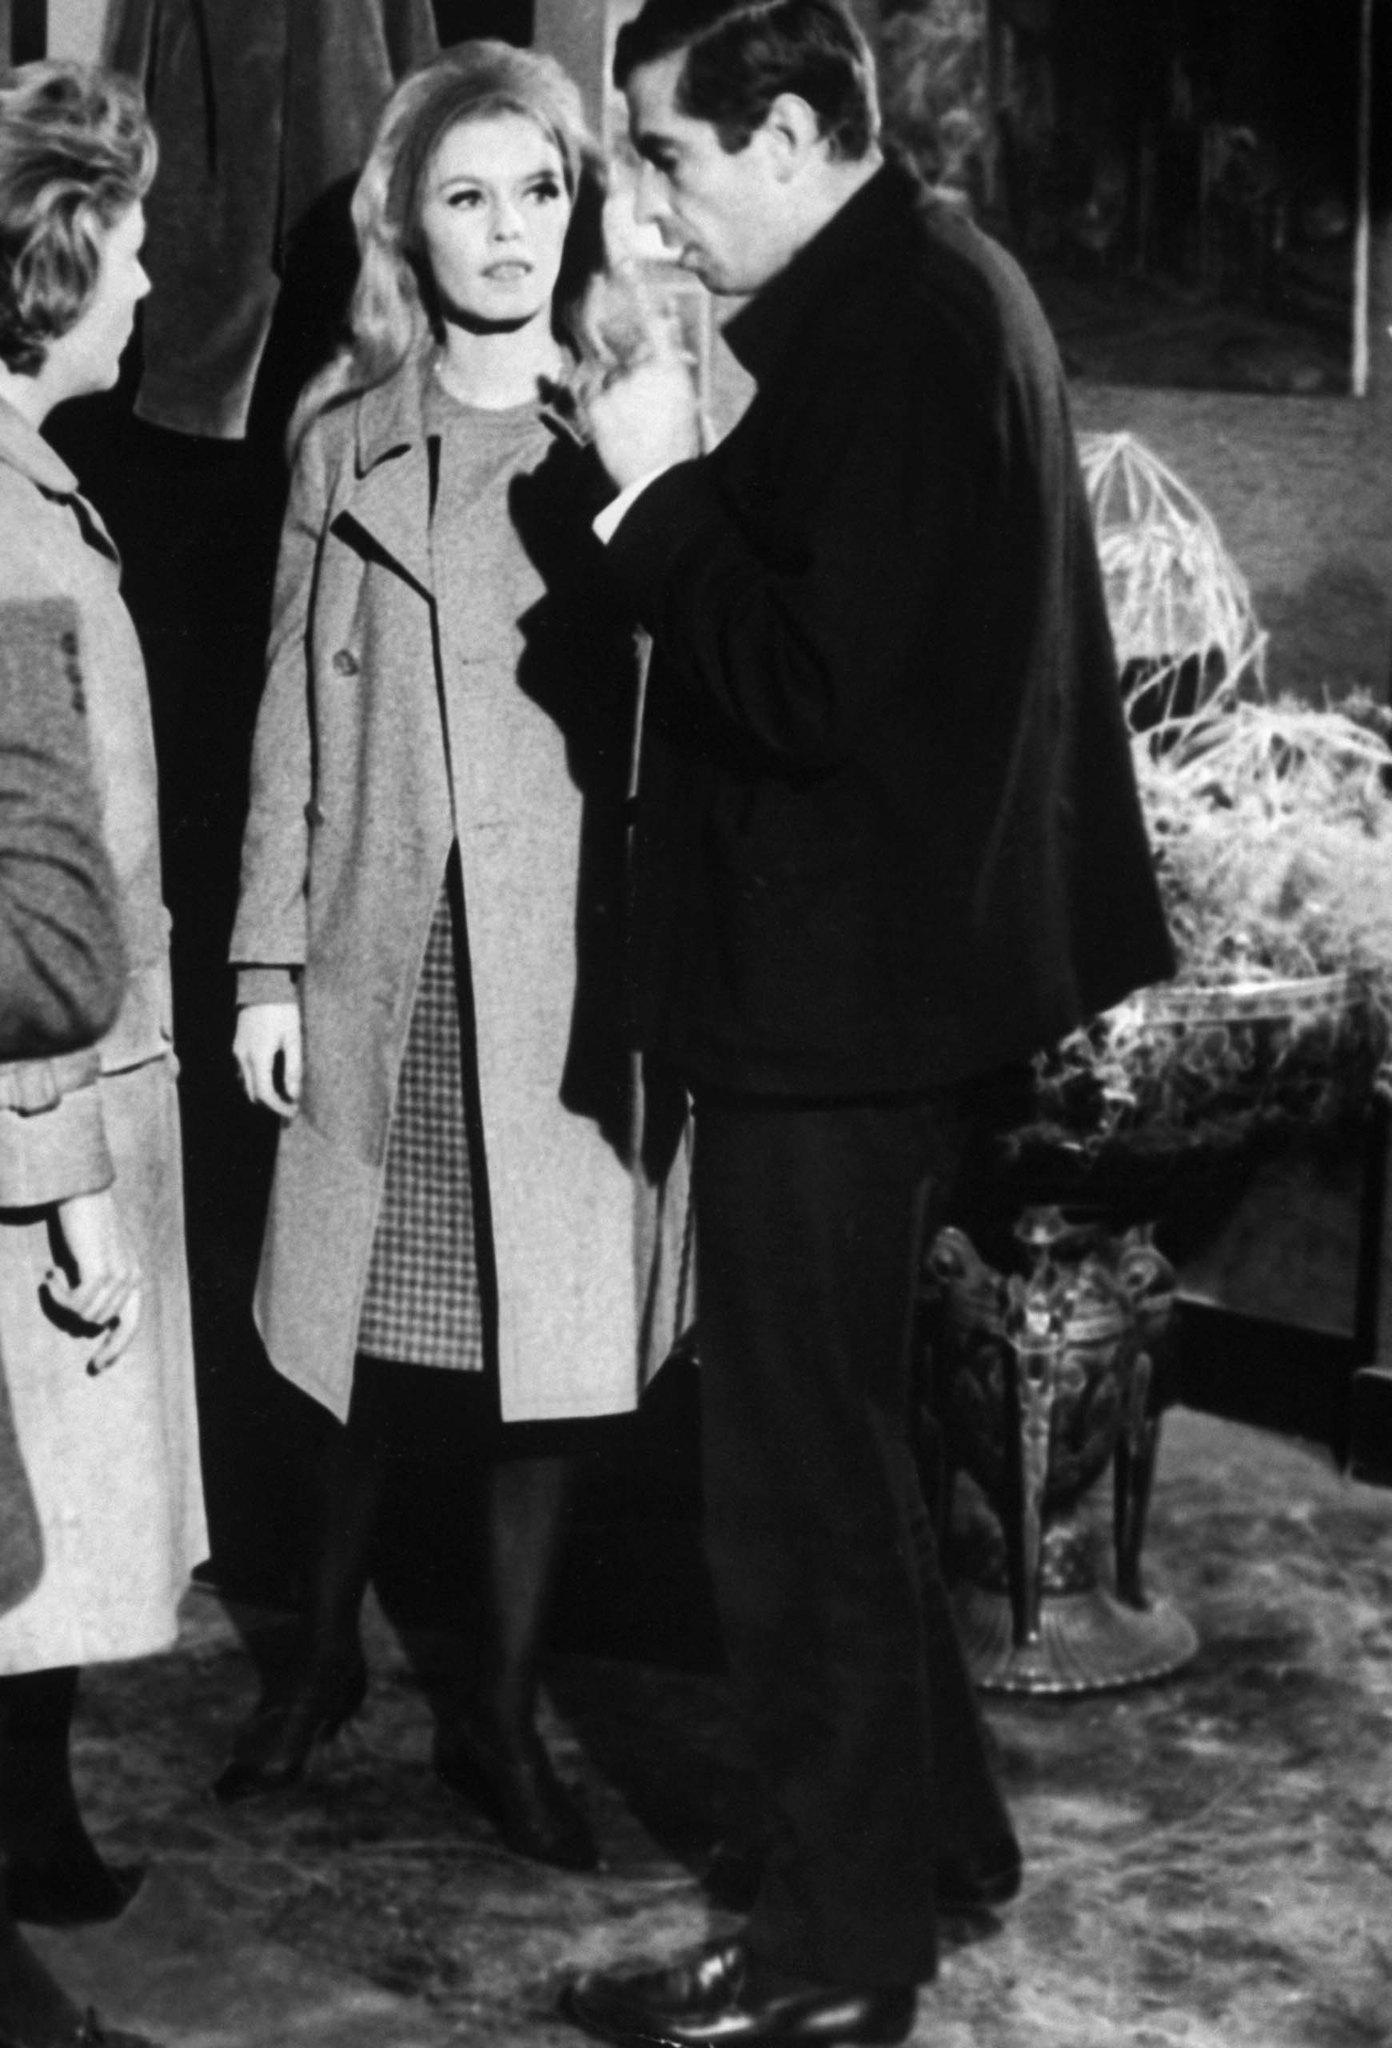 Brigitte Bardot and Roger Vadim in Le repos du guerrier (1962)